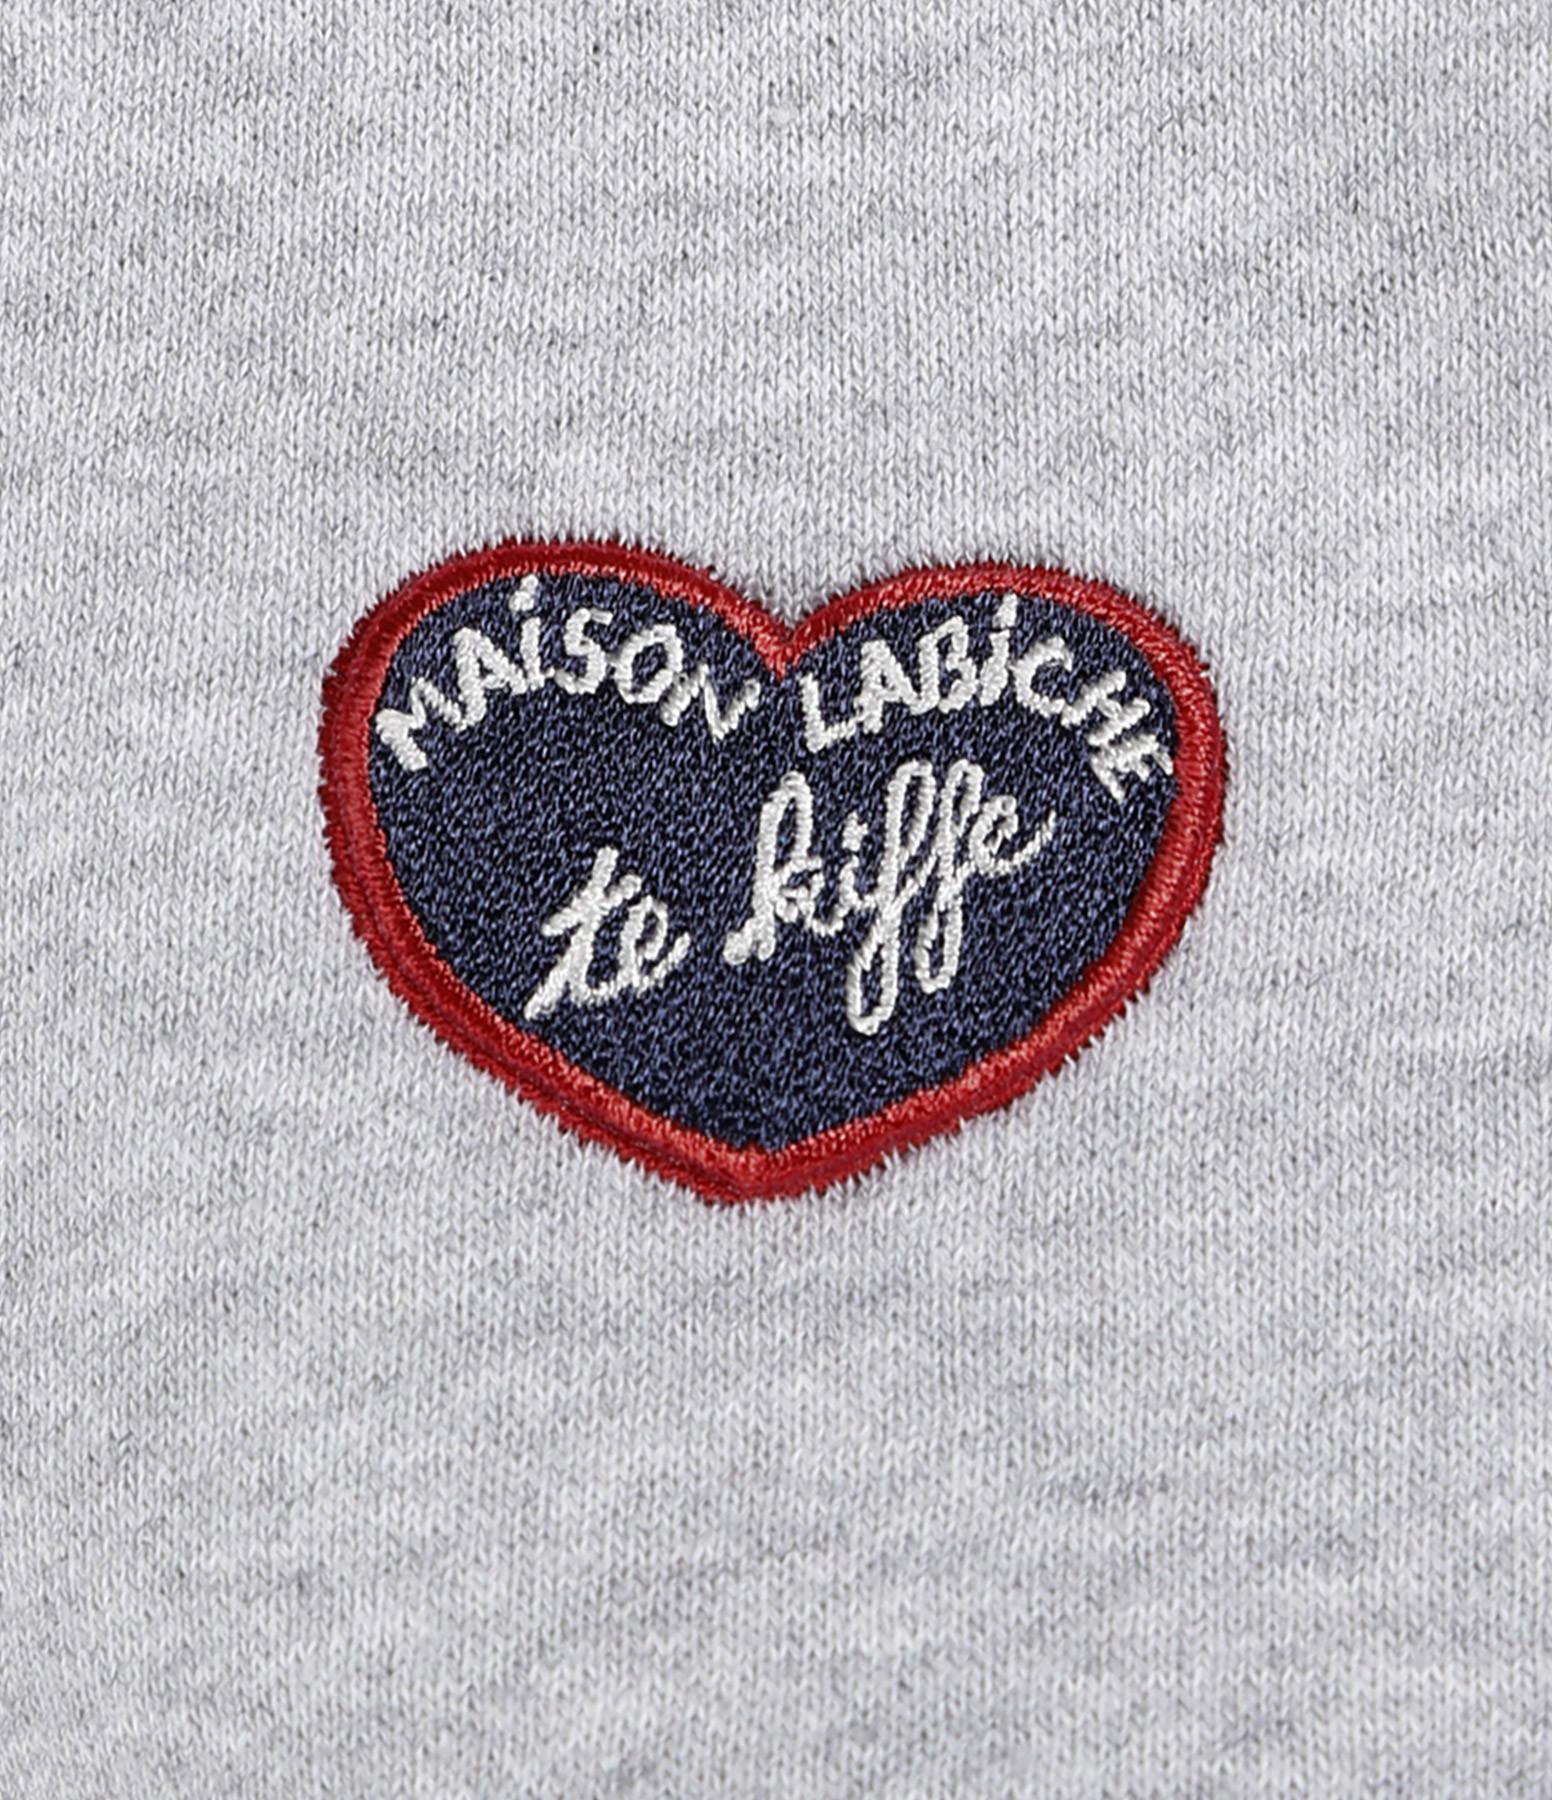 MAISON LABICHE - Sweatshirt Hoodie MLB Te Kiff Coton Gris Chiné